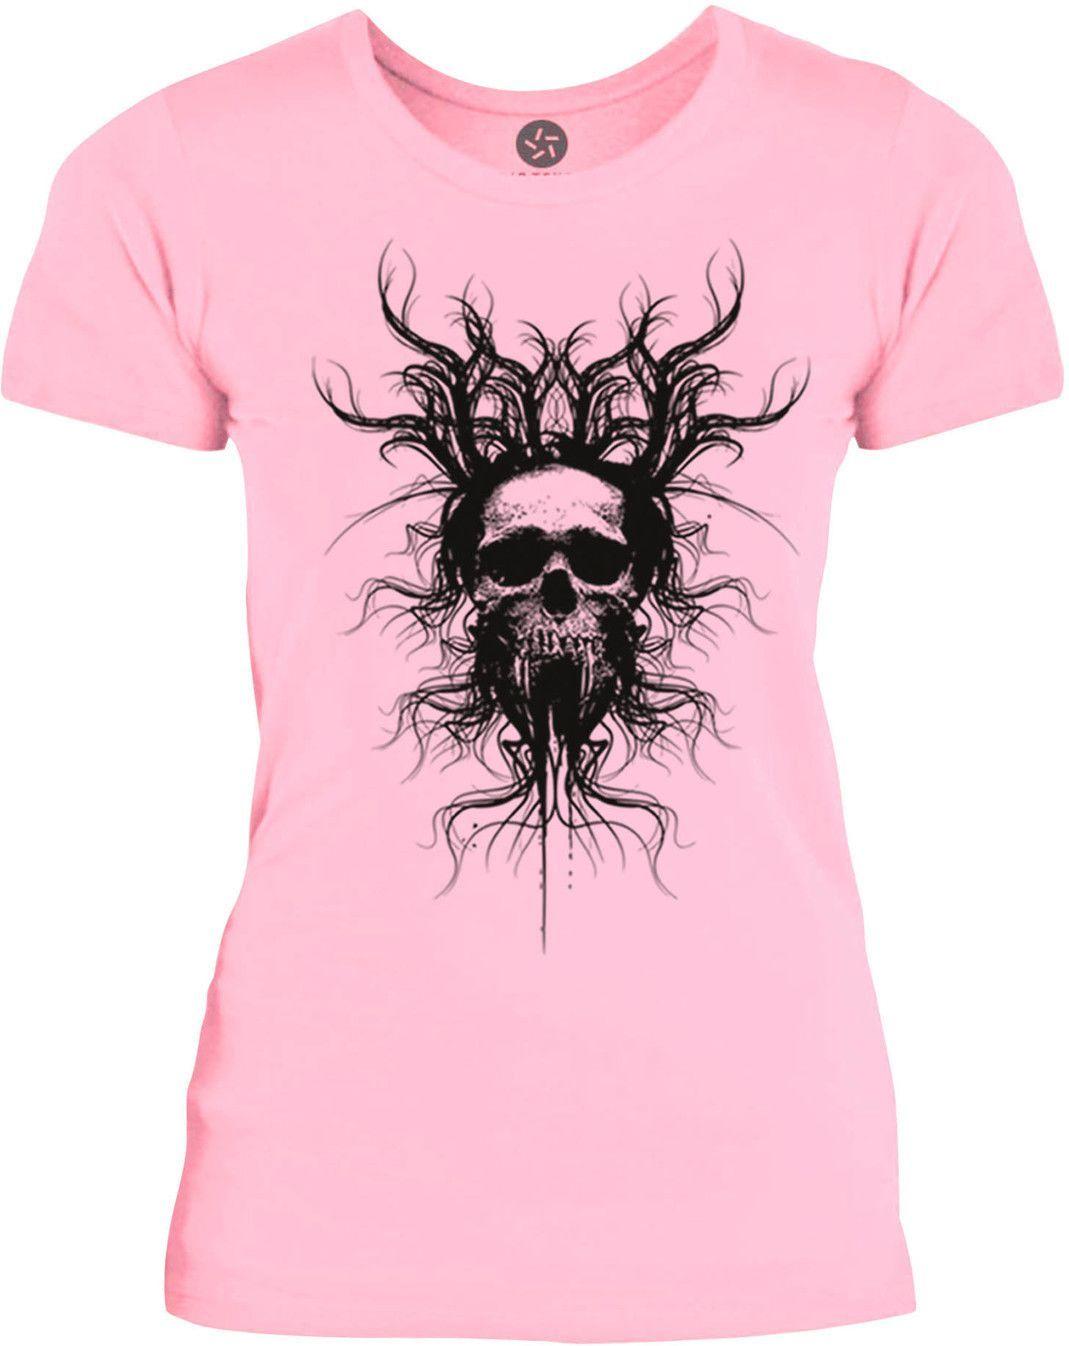 Big Texas Infected Skull (Black) Womens Fine Jersey T-Shirt